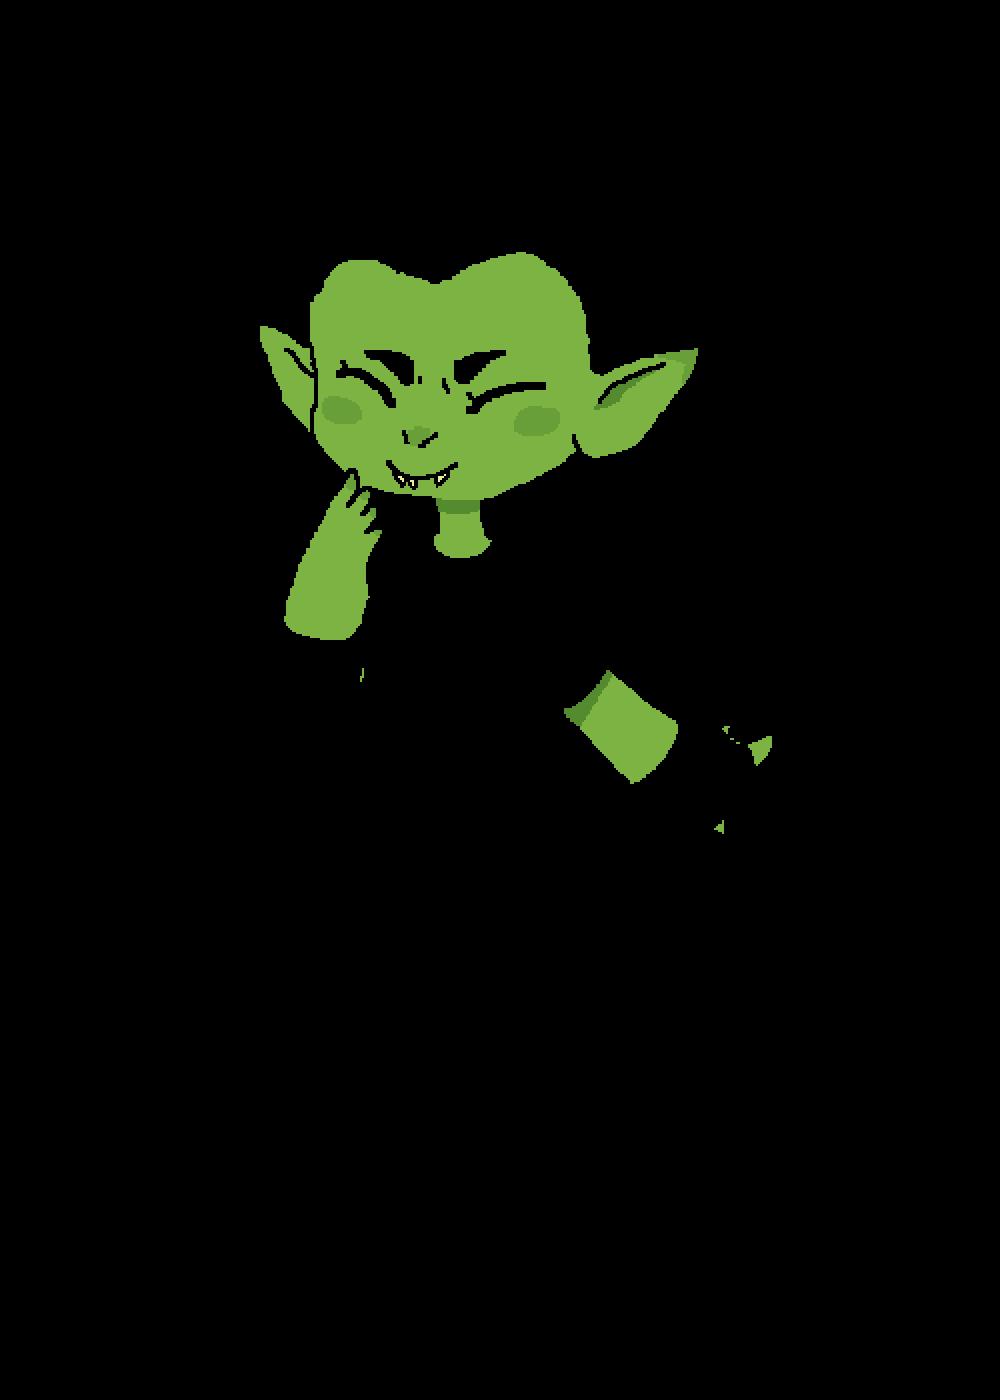 Gimmick (WIP) by chubbydawulf